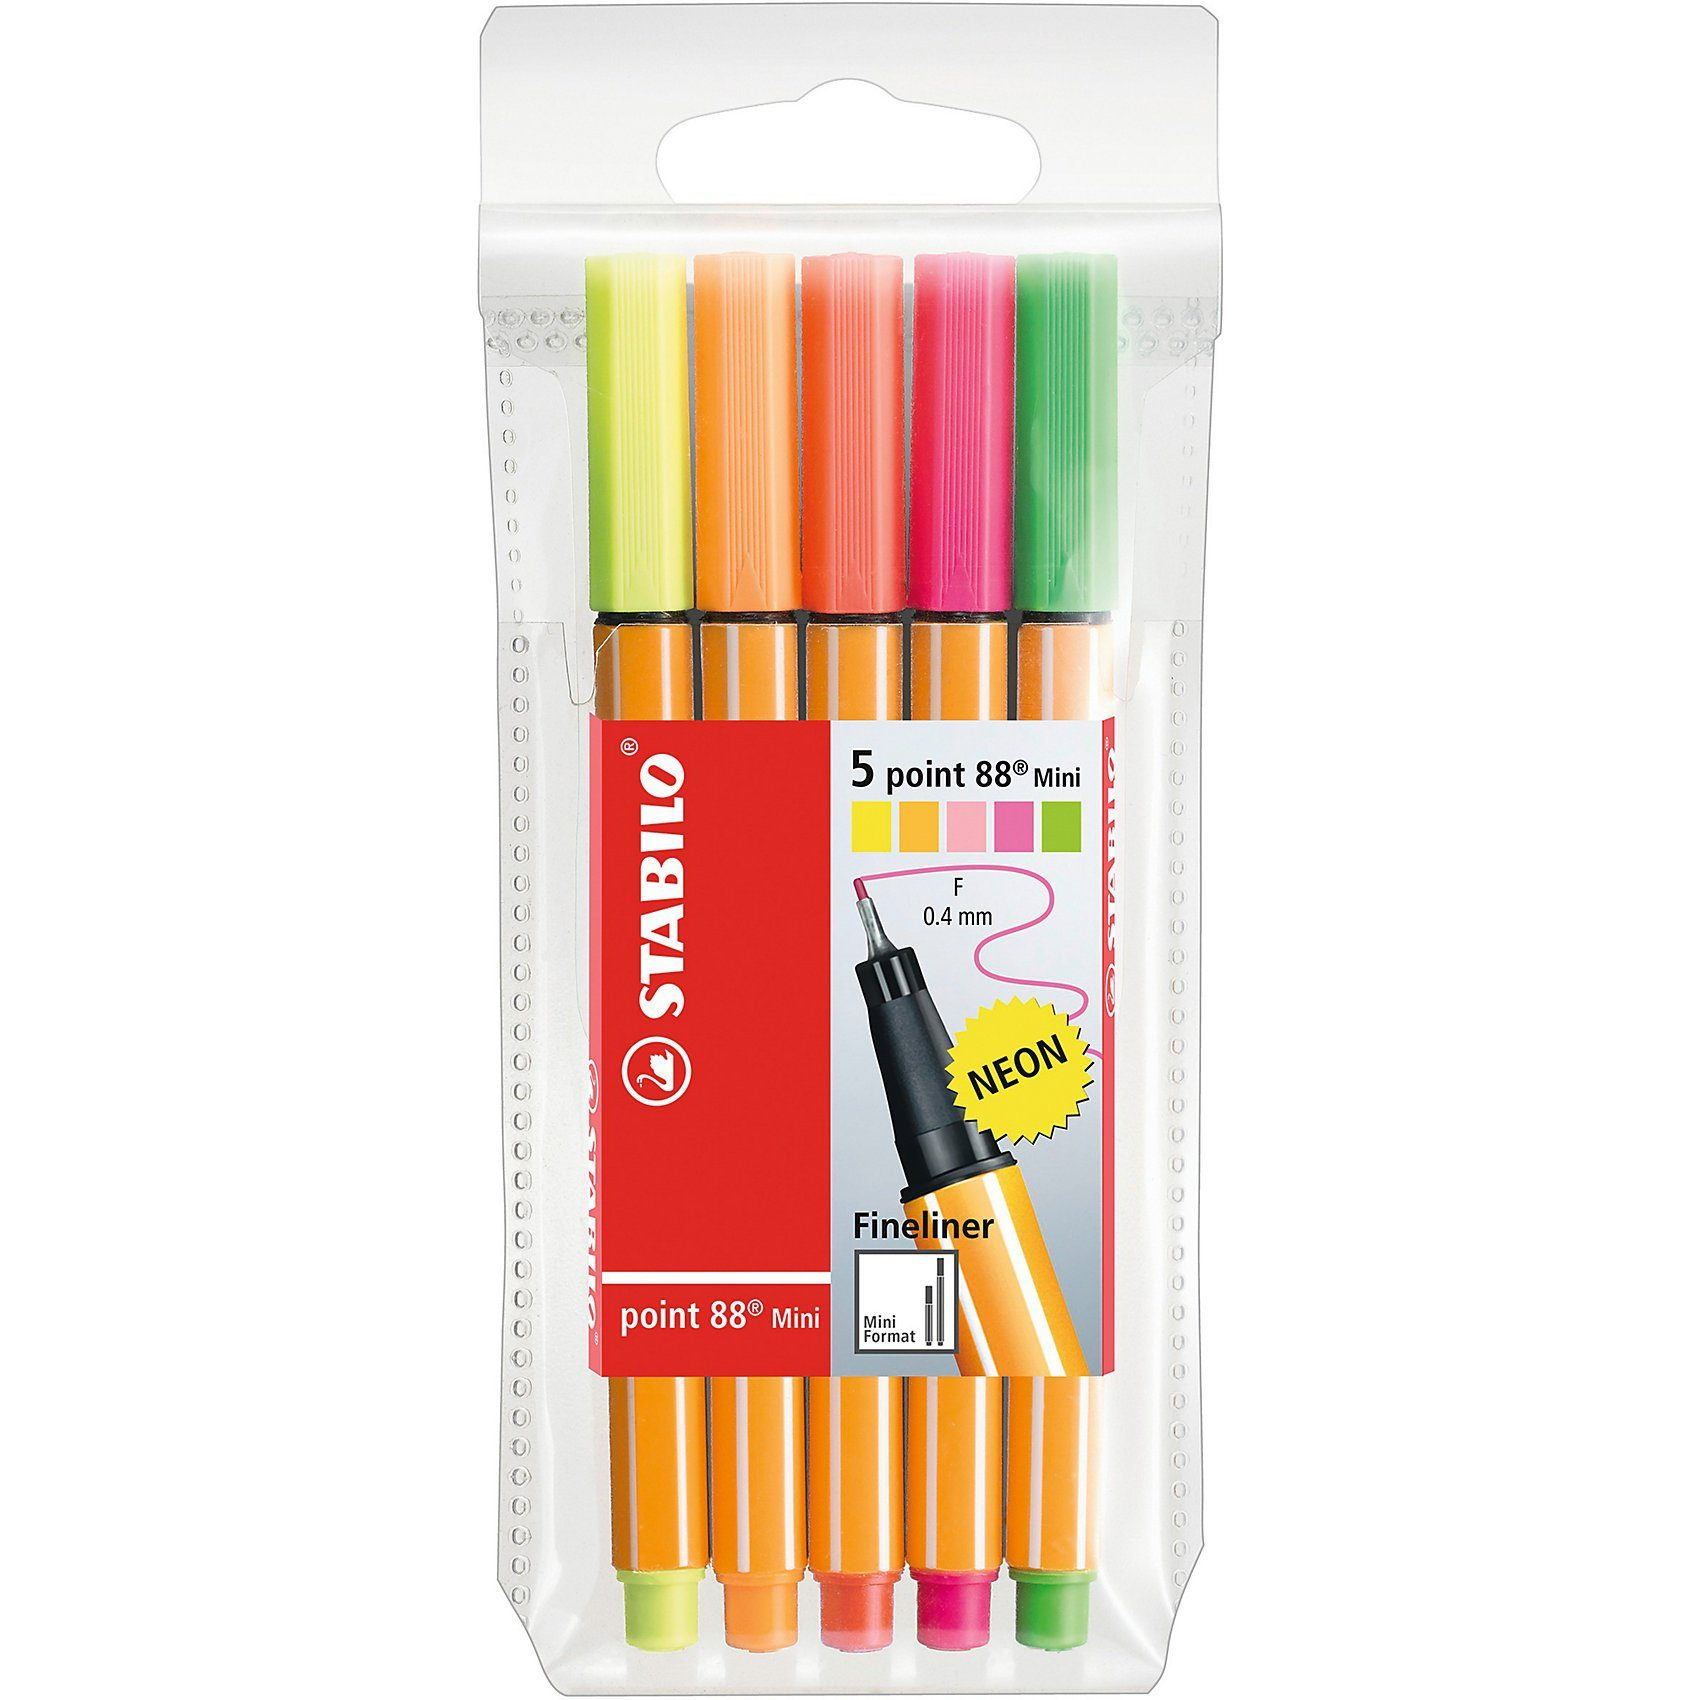 Stabilo Fineliner point 88 Mini NEON, 5 Farben